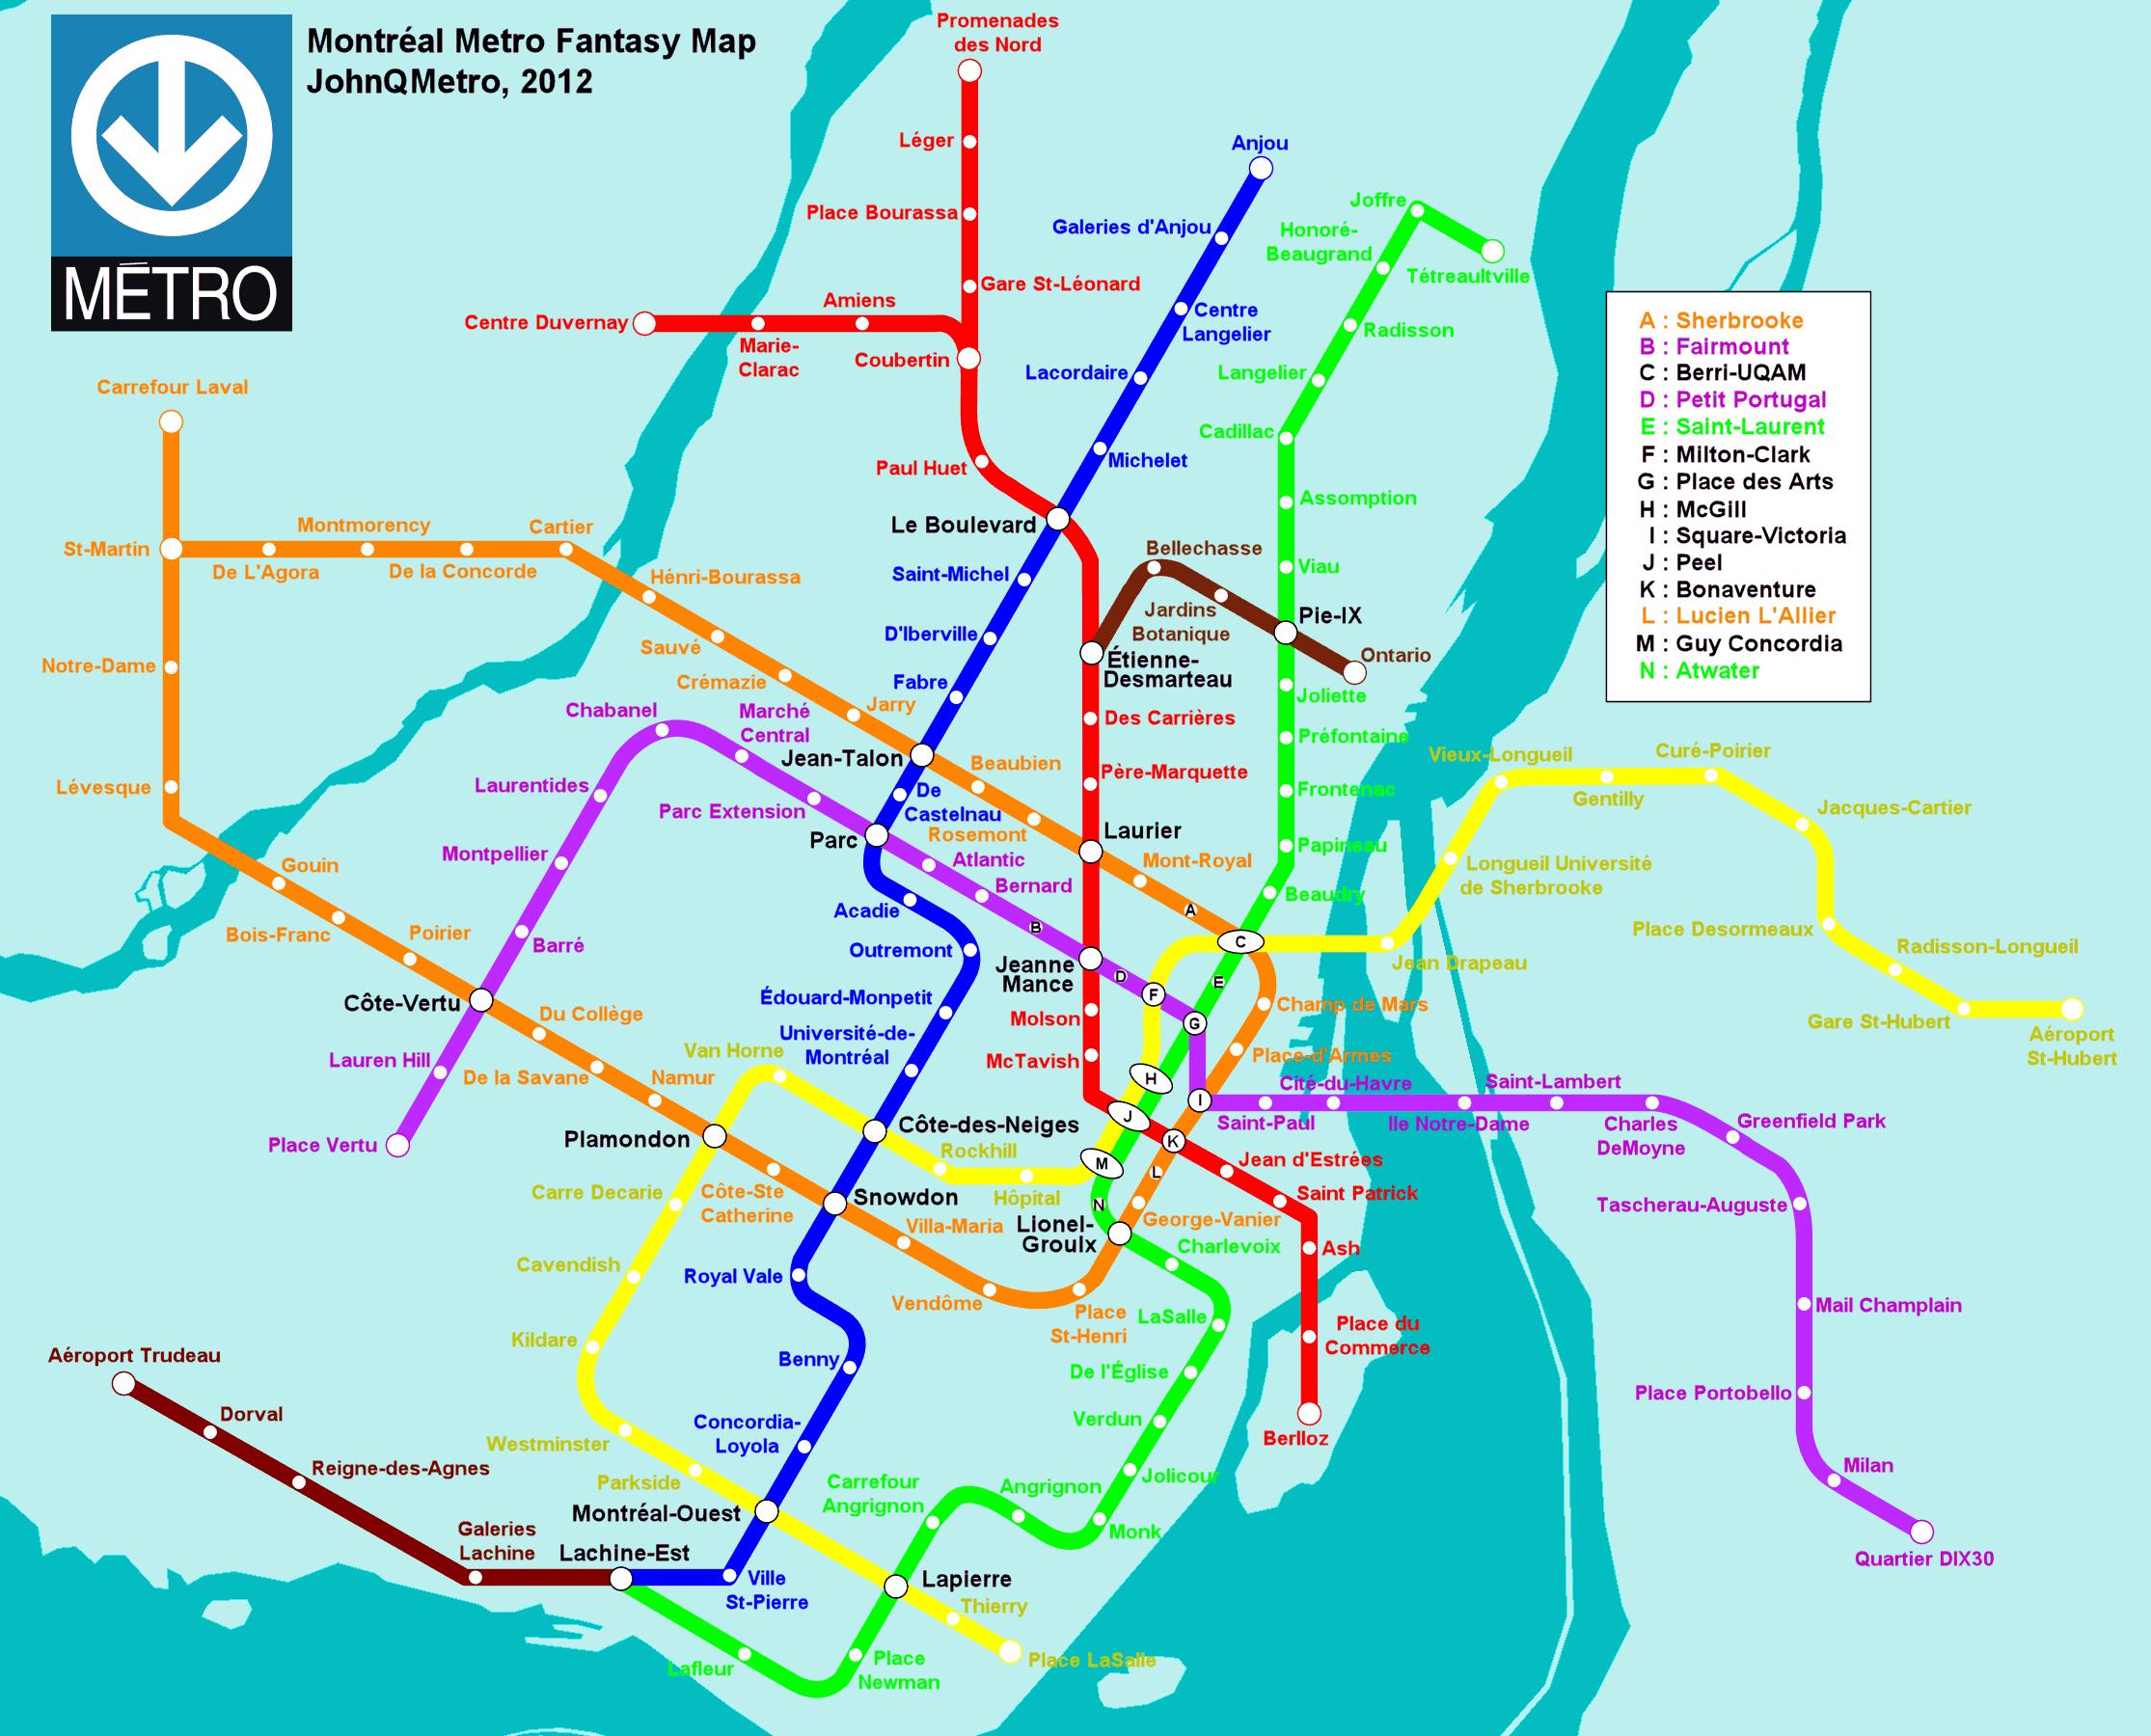 Fantasy Metro Maps